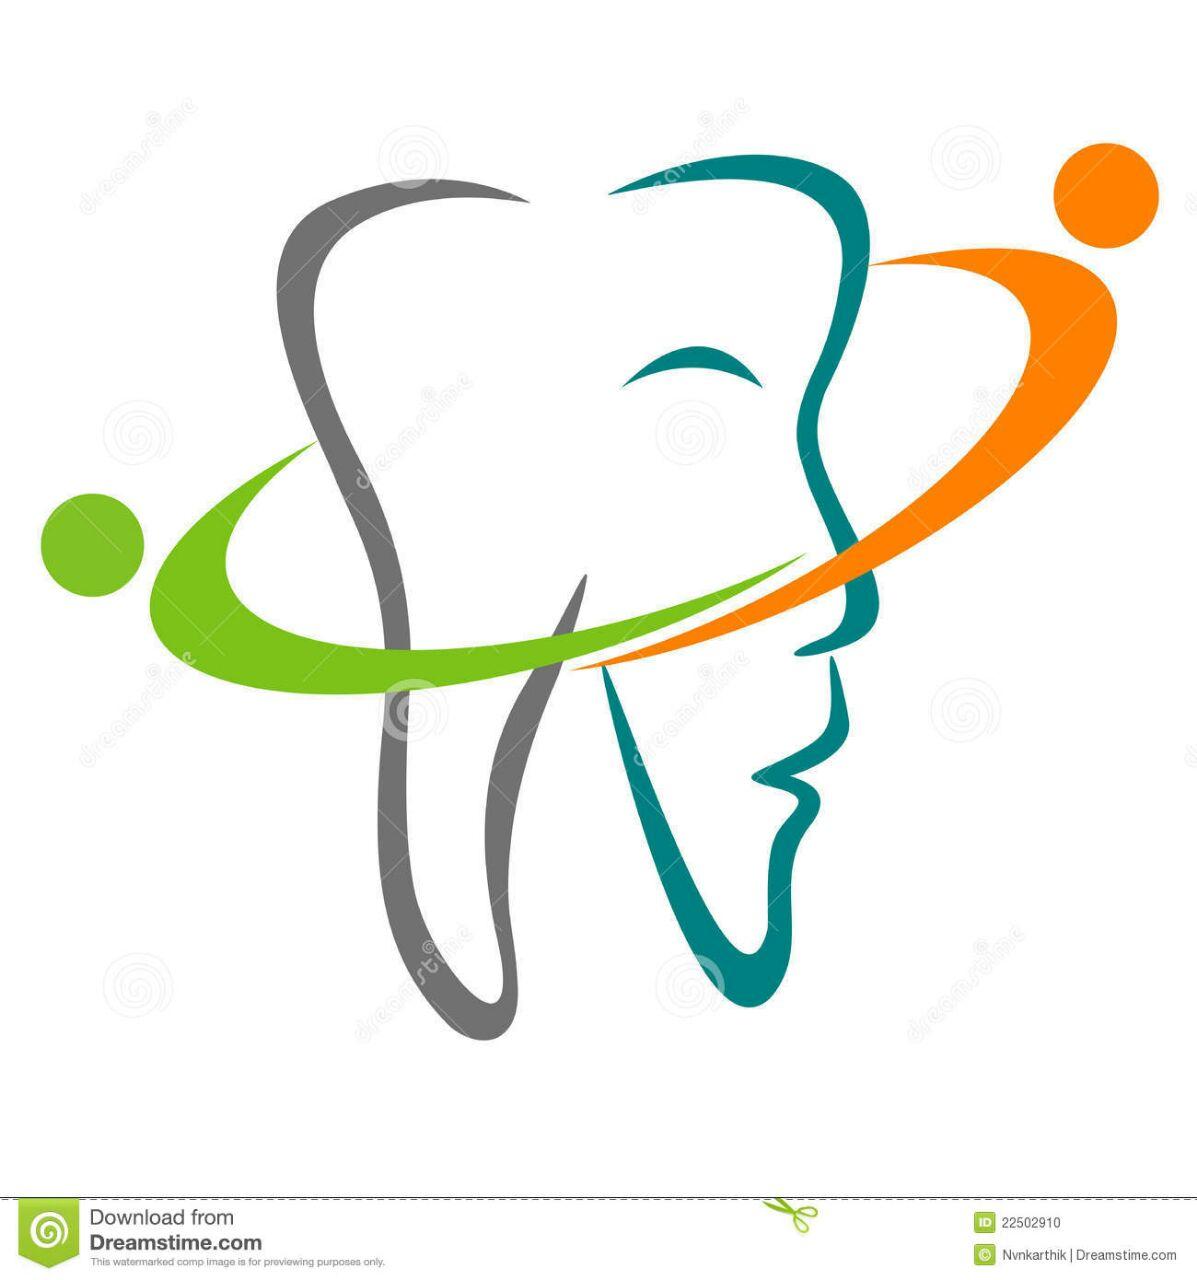 Dr Borole's Dental Clinic & Implant Center (Multispeciality Dental Care Center)